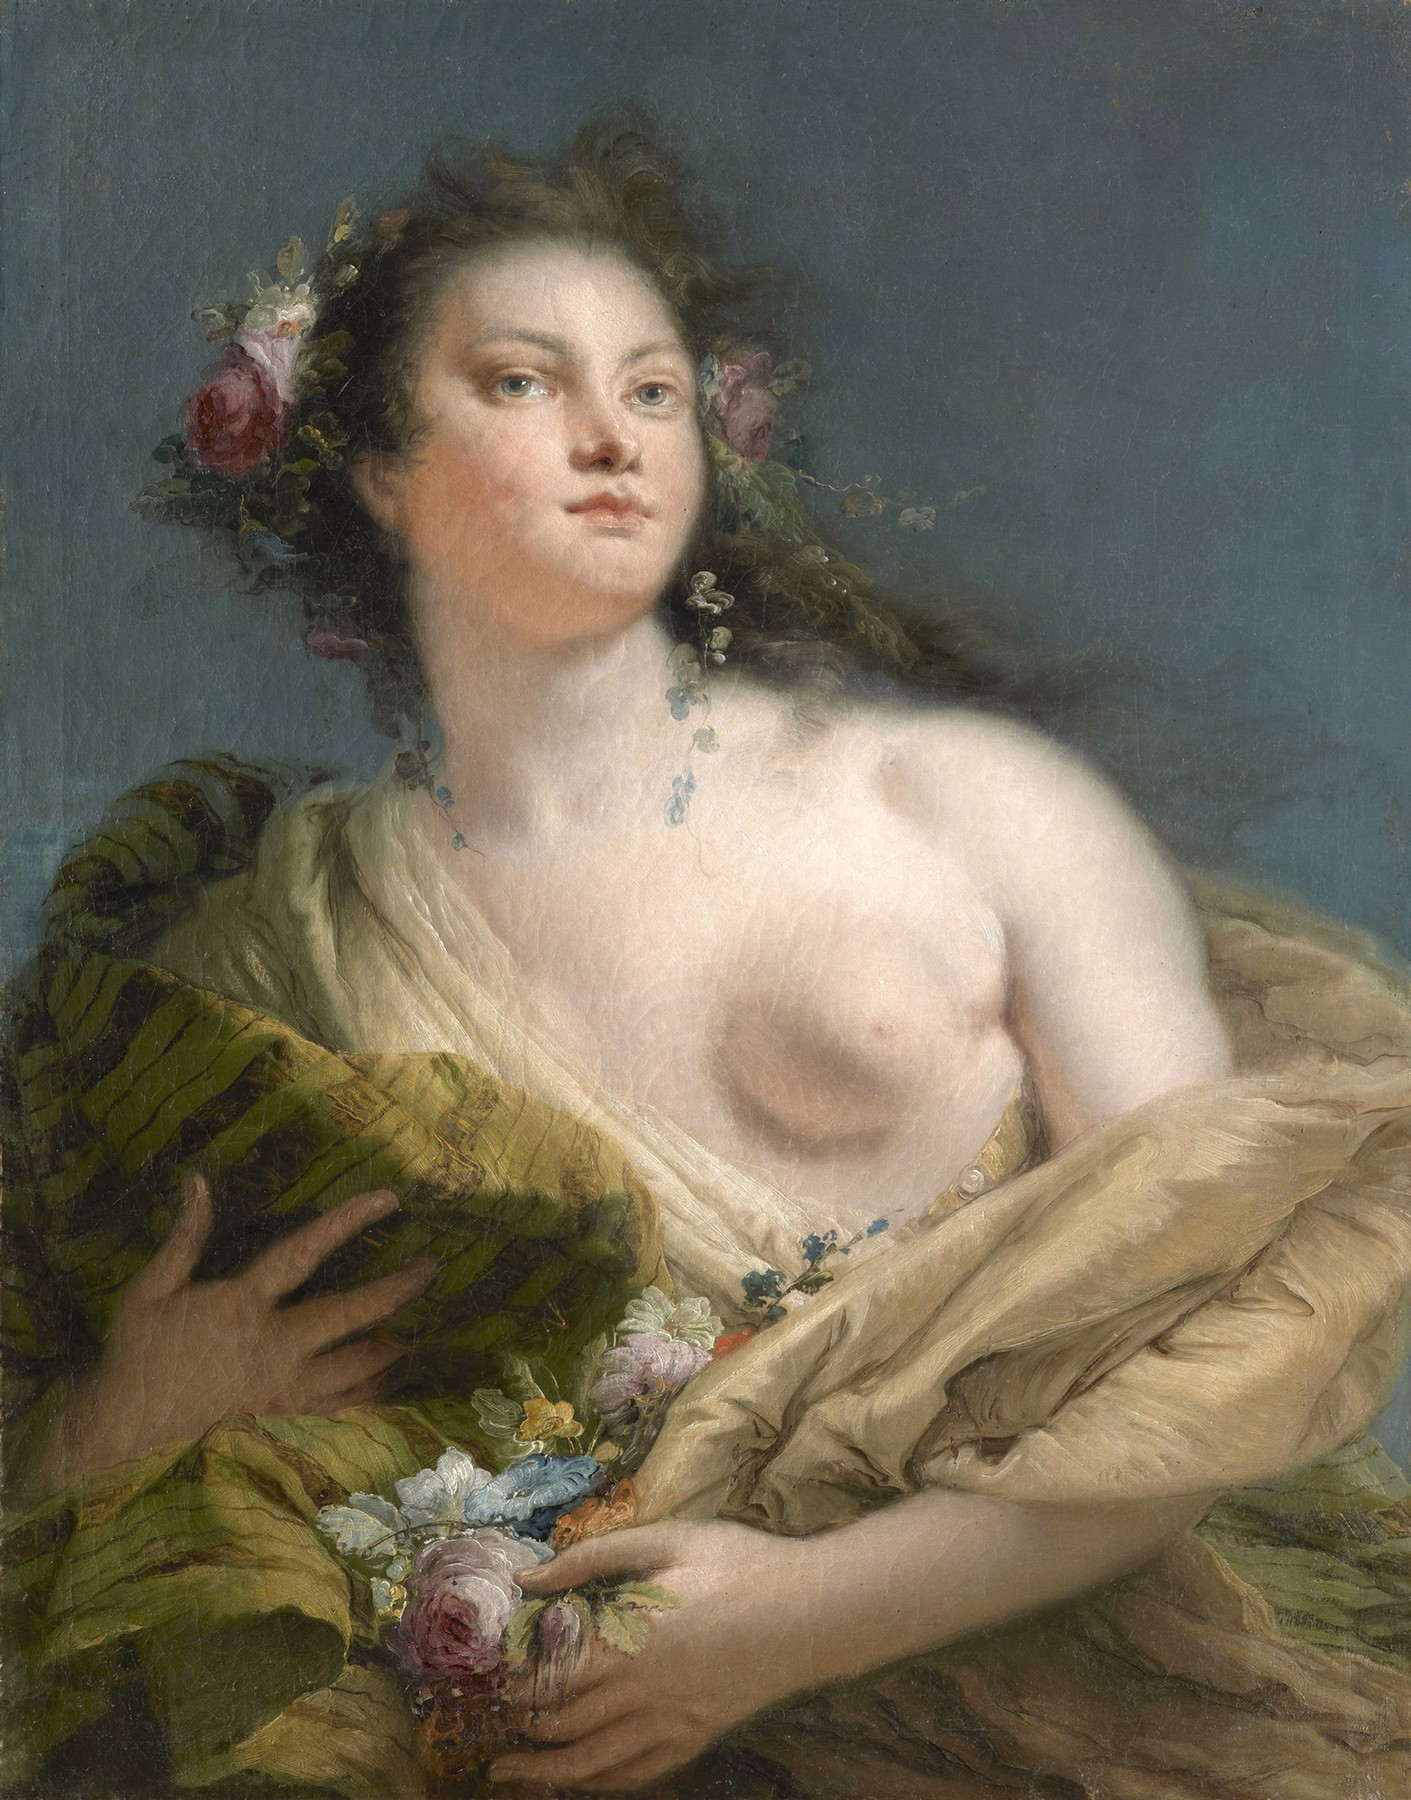 Portrait of a Lady as Flora Giovanni Battista Tiepolo